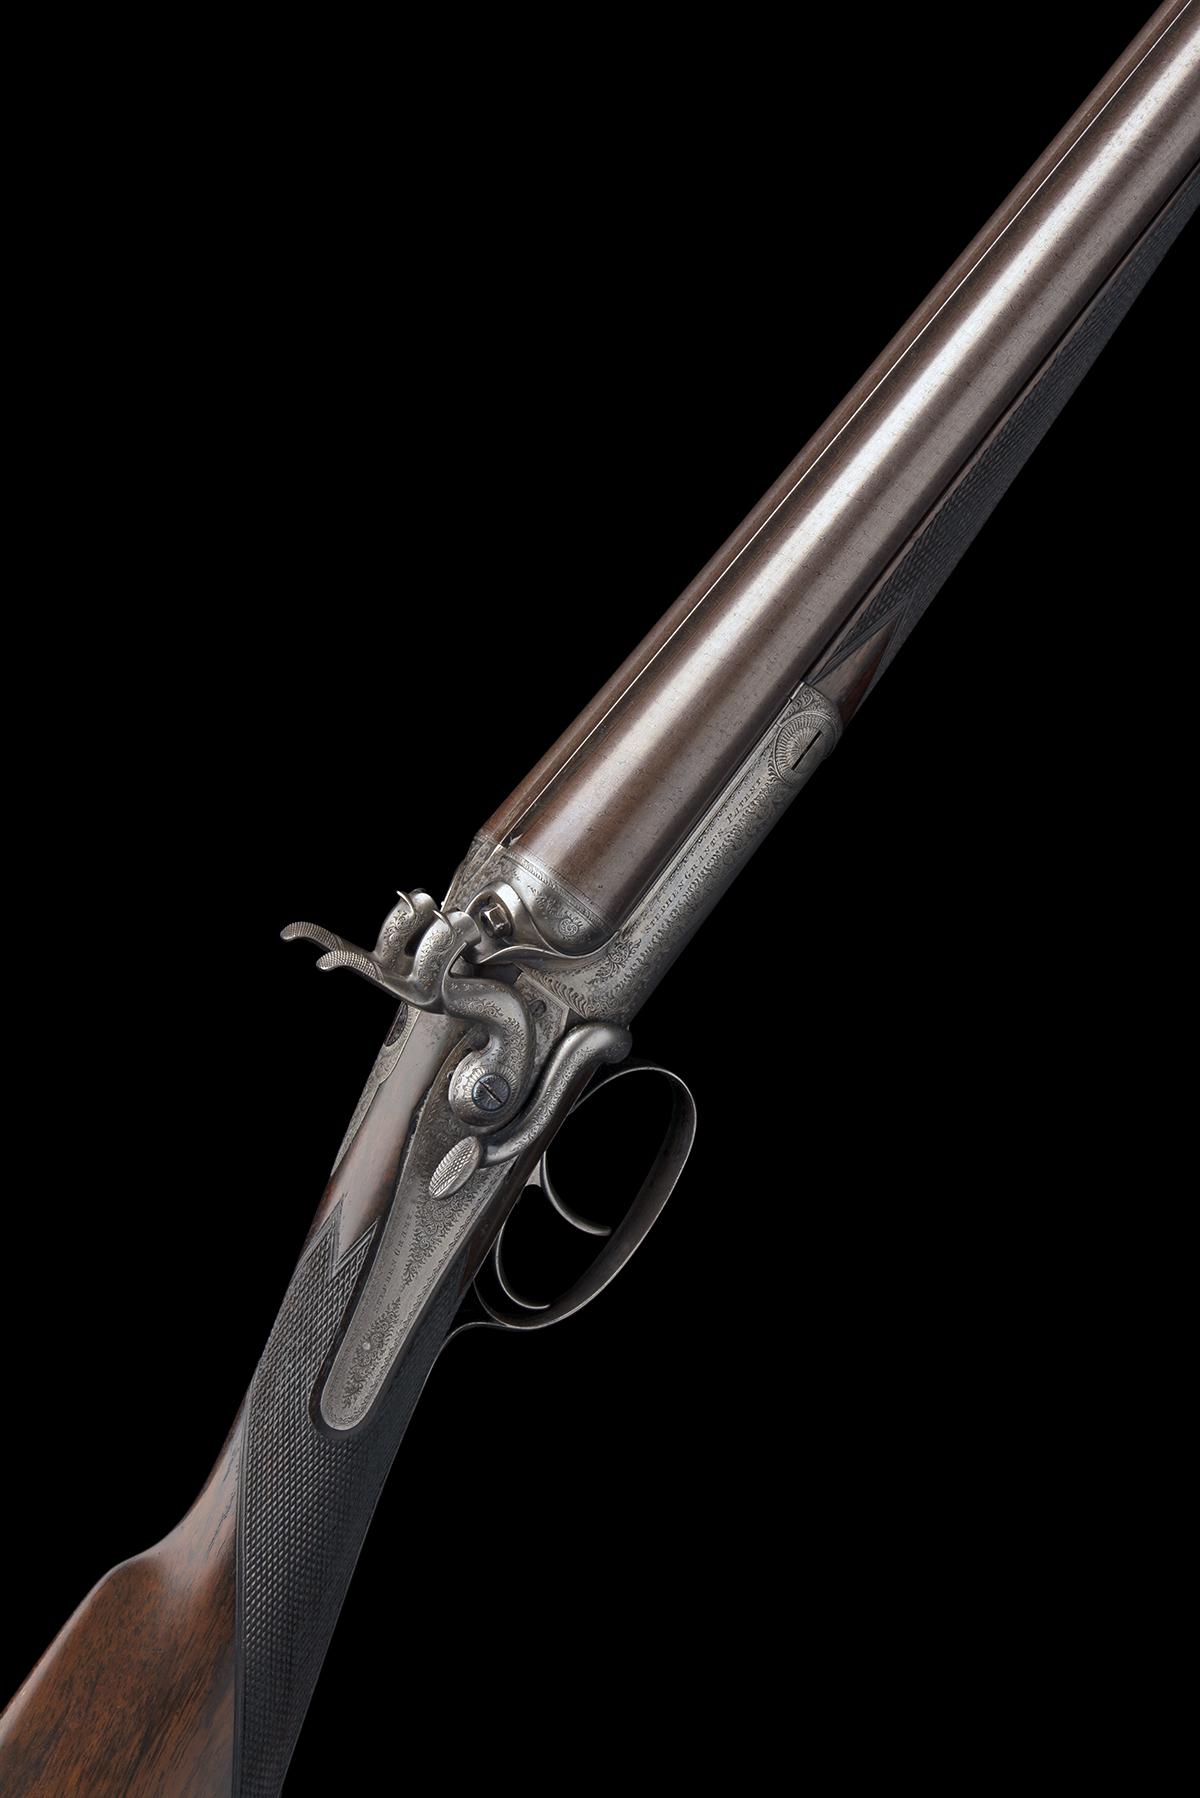 STEPHEN GRANT A 12-BORE 1871 PATENT SIDELEVER HAMMERGUN, serial no. 4419, for 1875, 30in. nitro